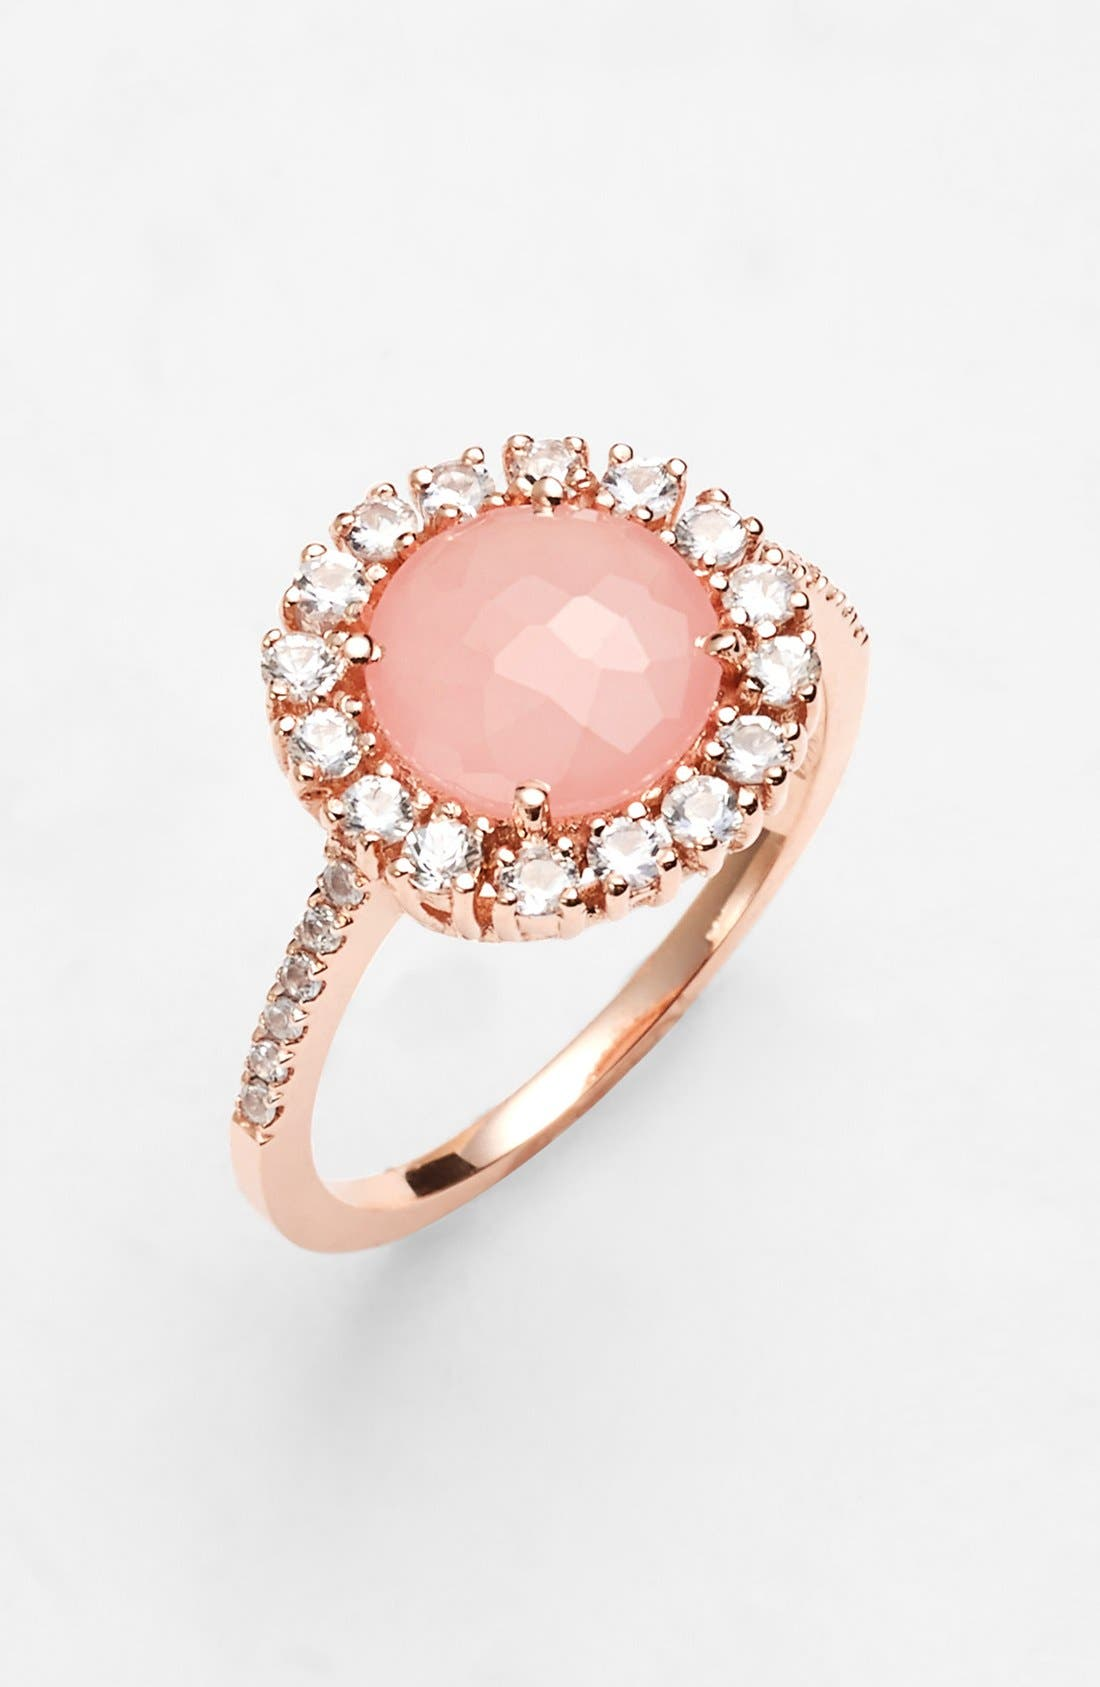 Main Image - KALAN by Suzanne Kalan Round Sapphire Bezel Ring